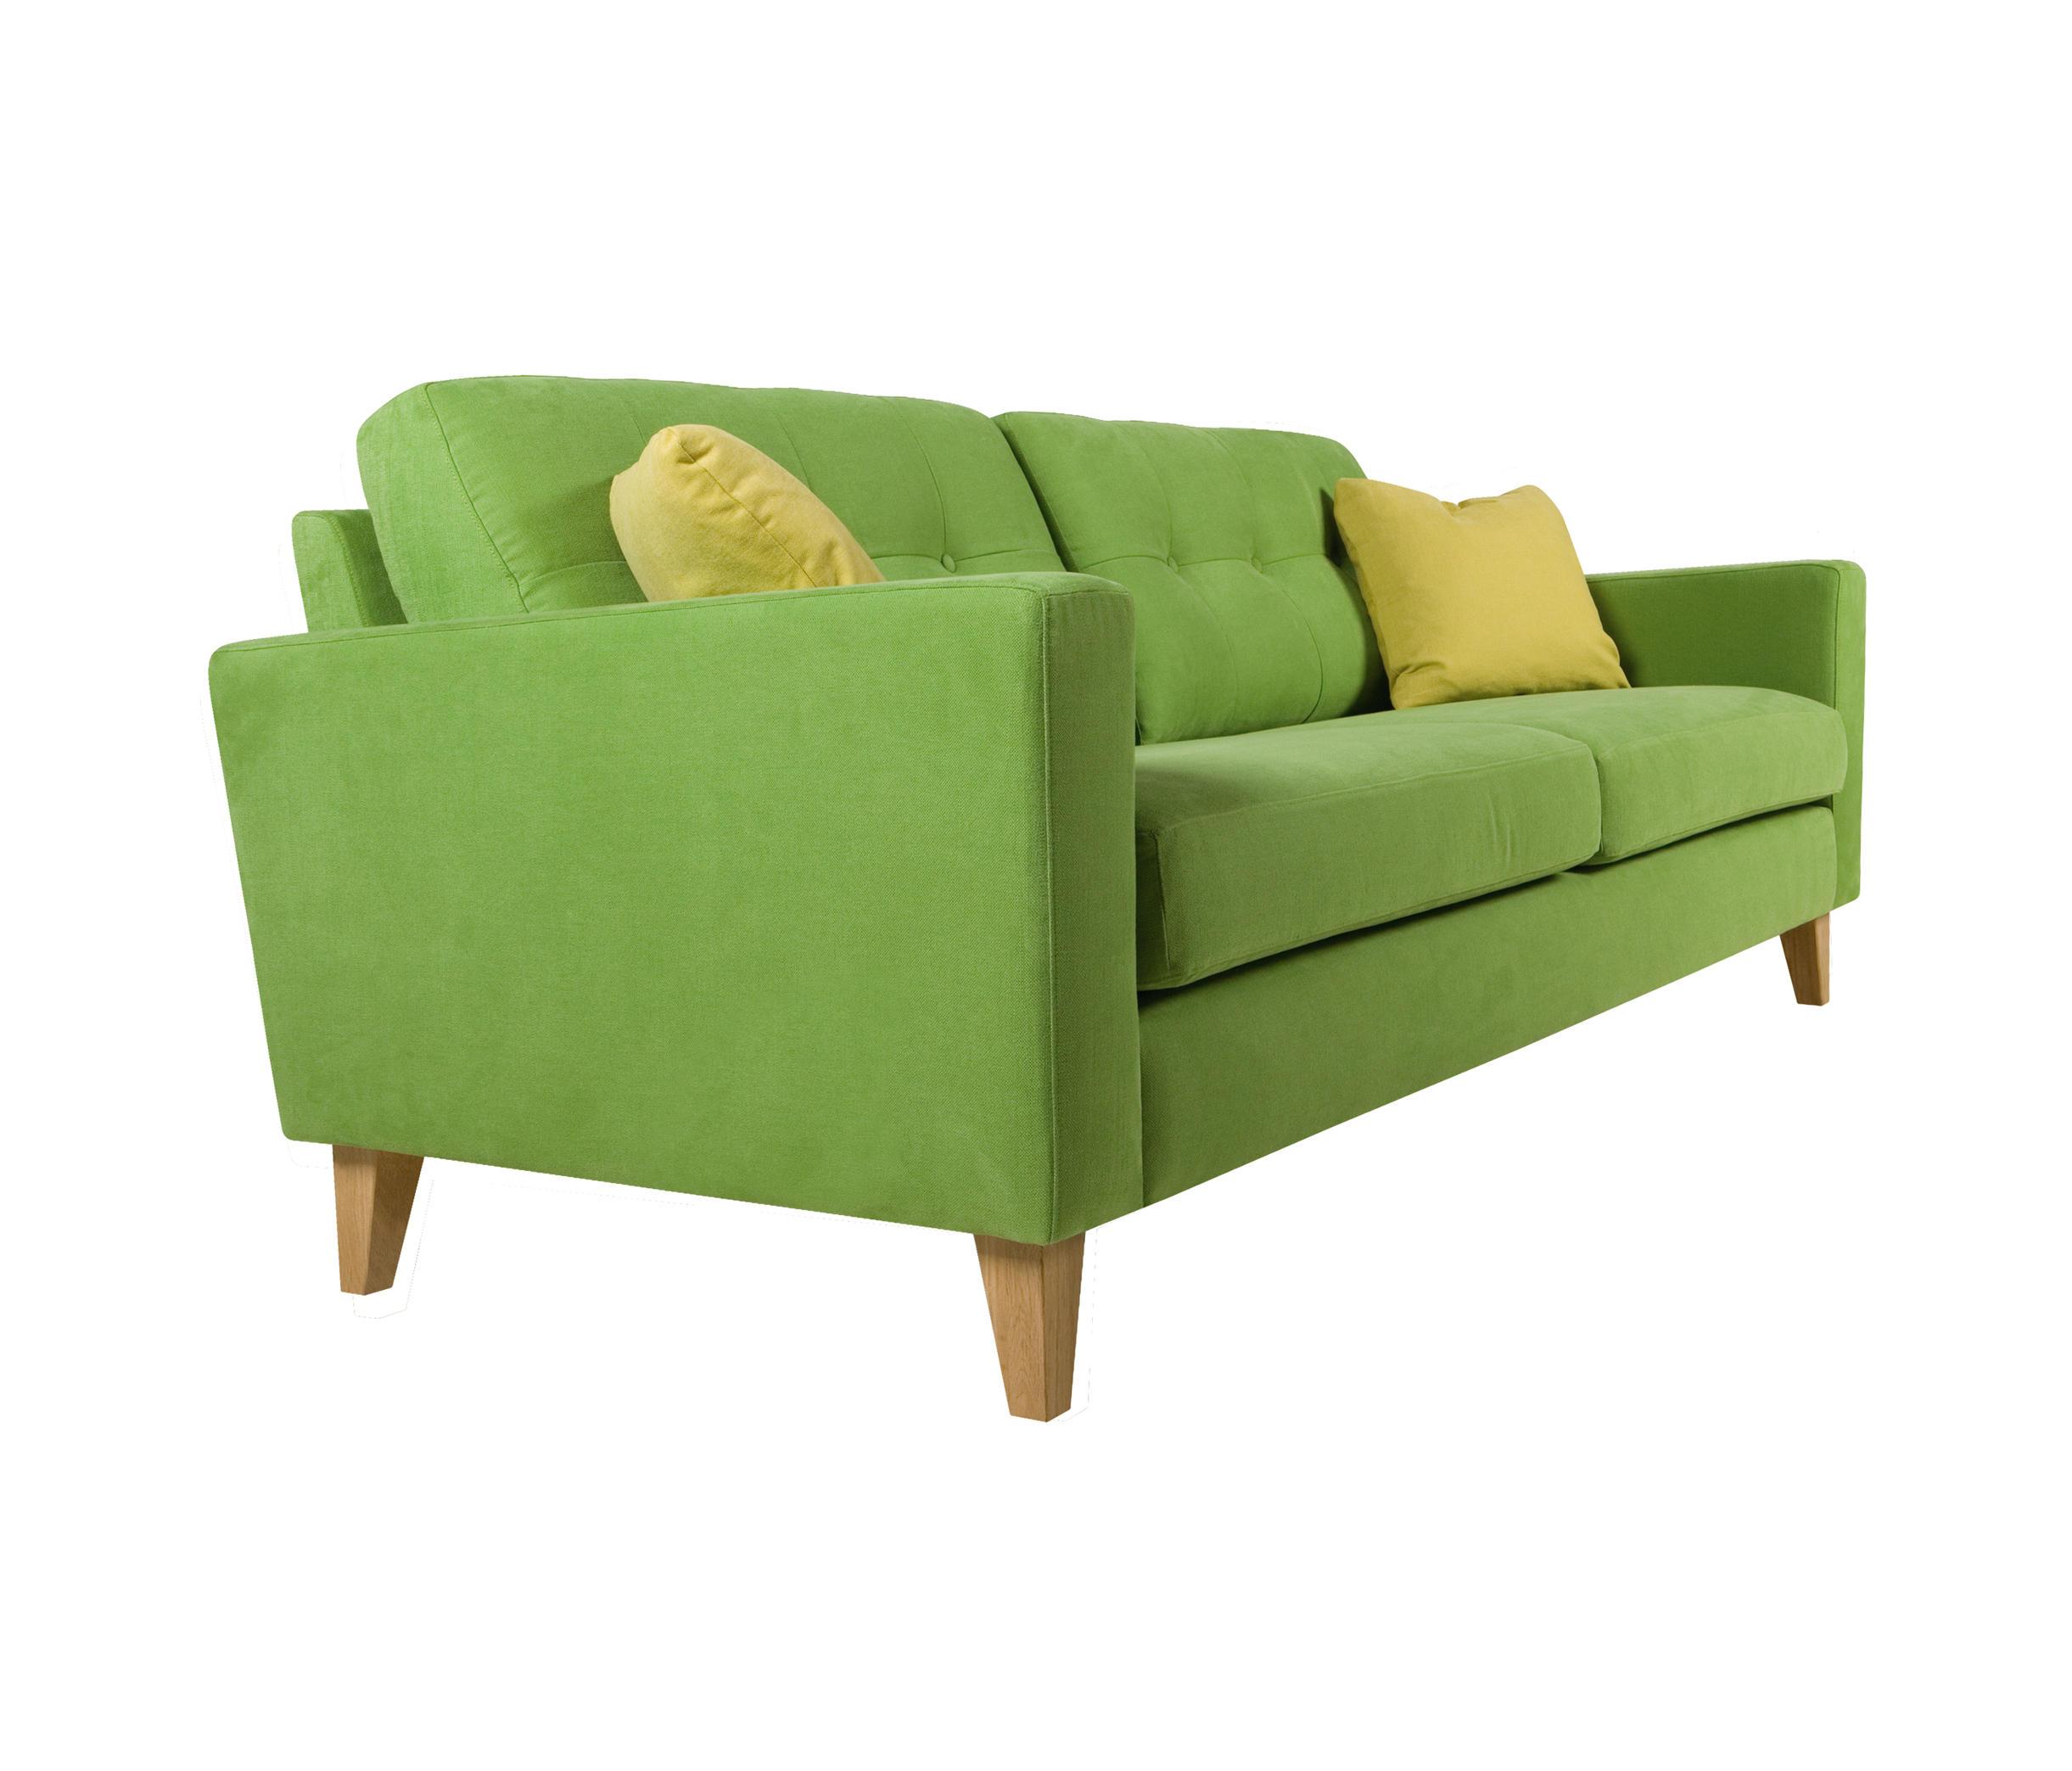 giorgio sofas von sits architonic. Black Bedroom Furniture Sets. Home Design Ideas